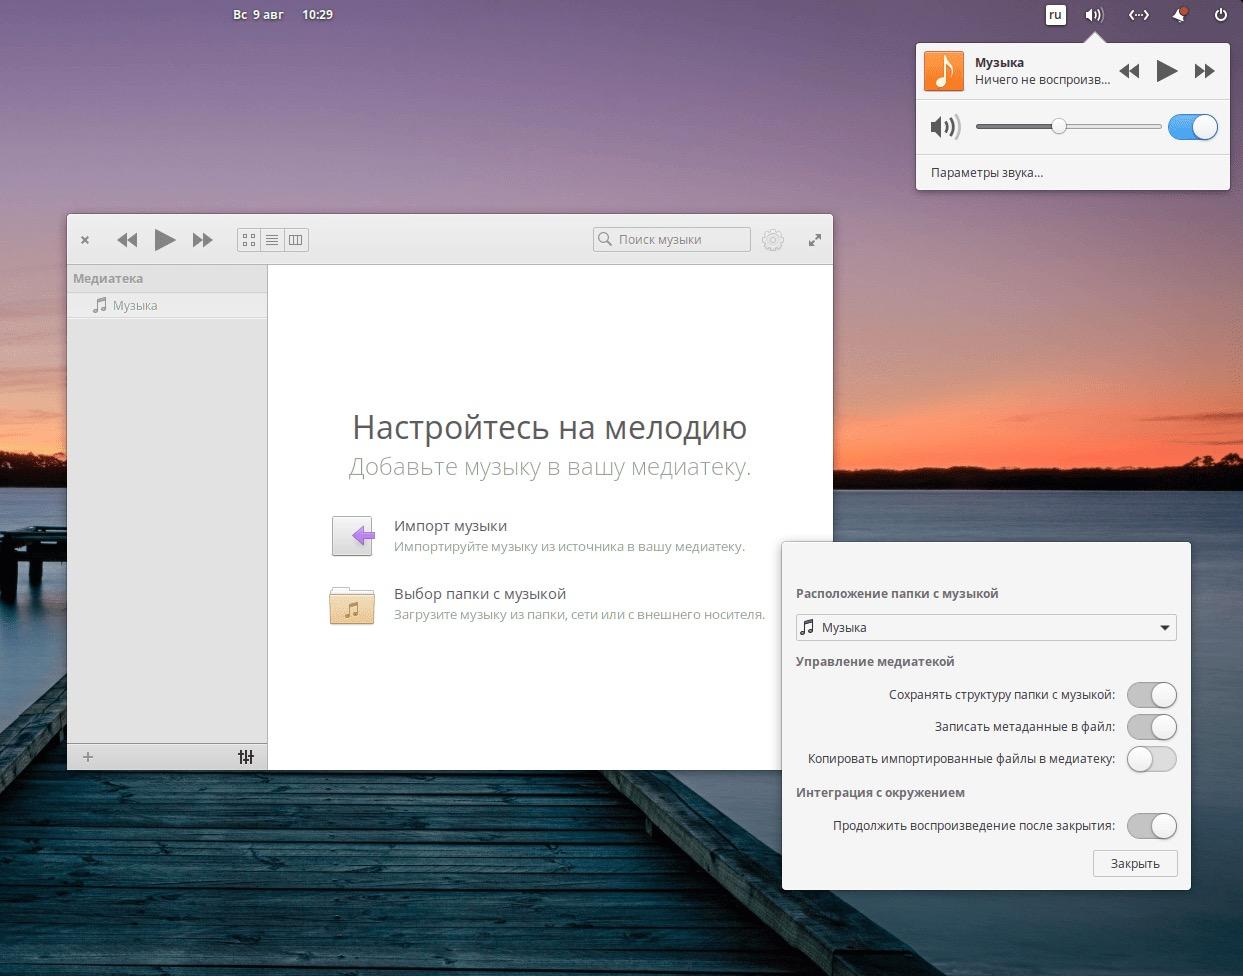 Elementary OS 5.1.7: Апплет проигрывания музыки и приложение Музыка